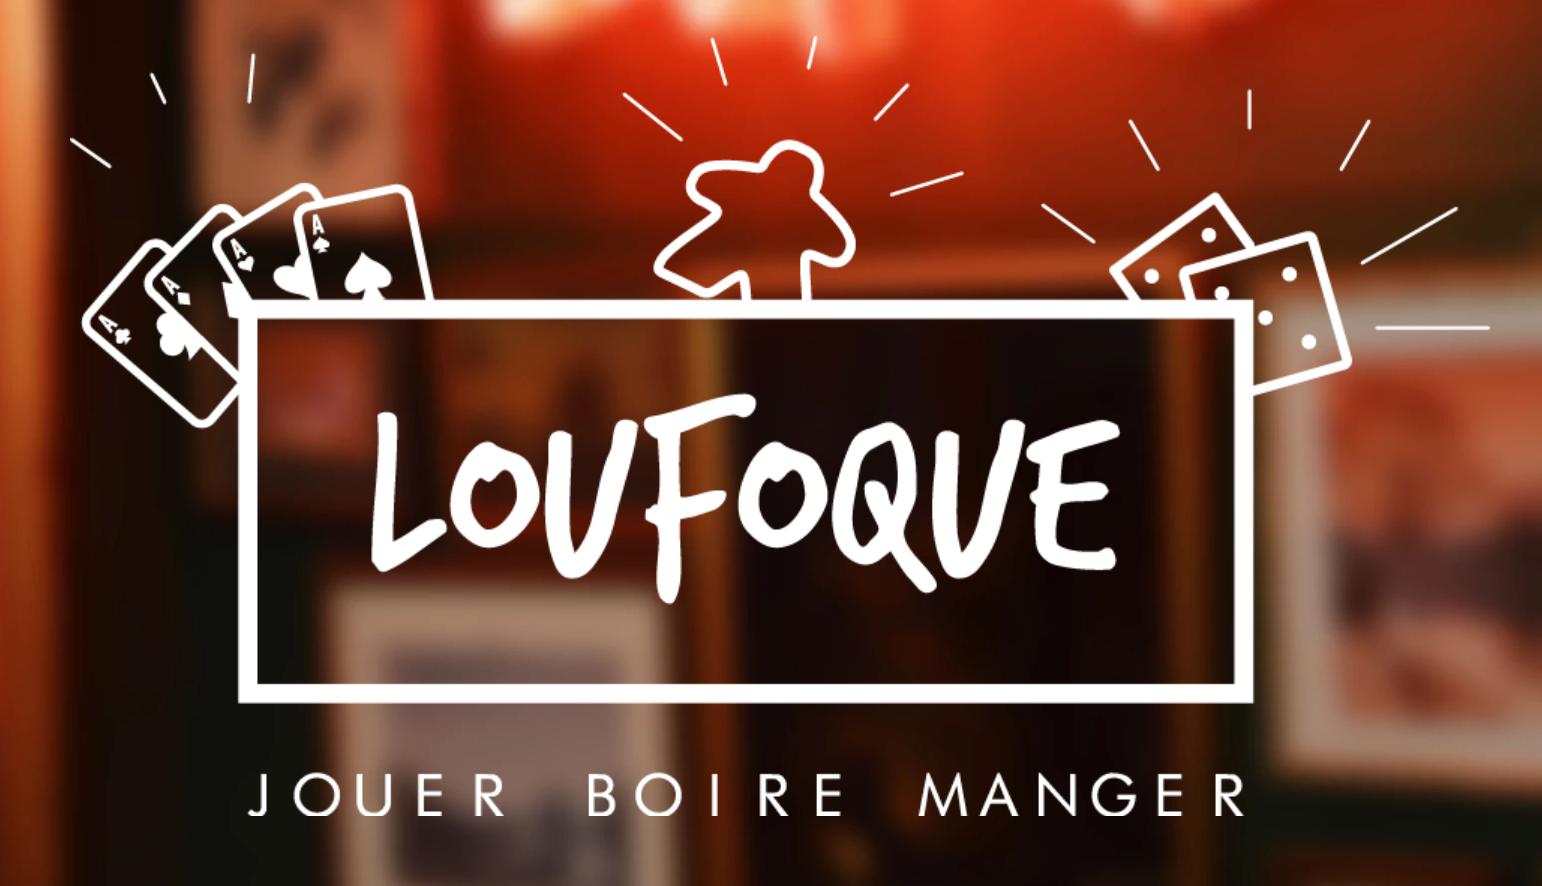 Loufoque